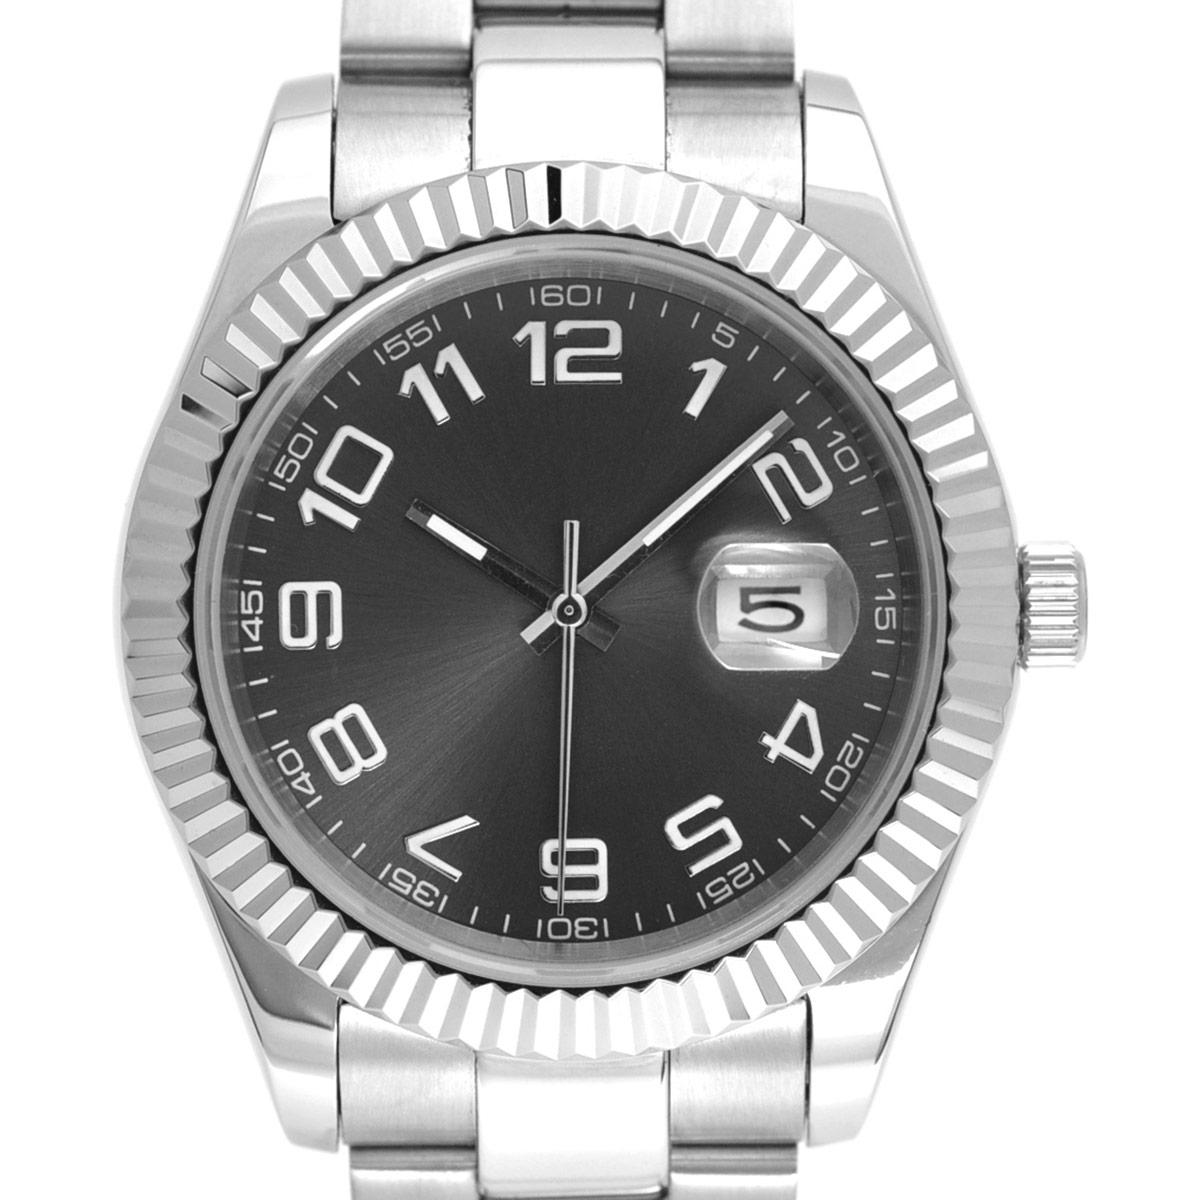 NOLOGO ノーロゴ 機械式腕時計 自動巻 オートマチック デイトジャスト DATE JUST 日付/夜光表示 [ NL-037ASG3AS ] シンプル メンズ